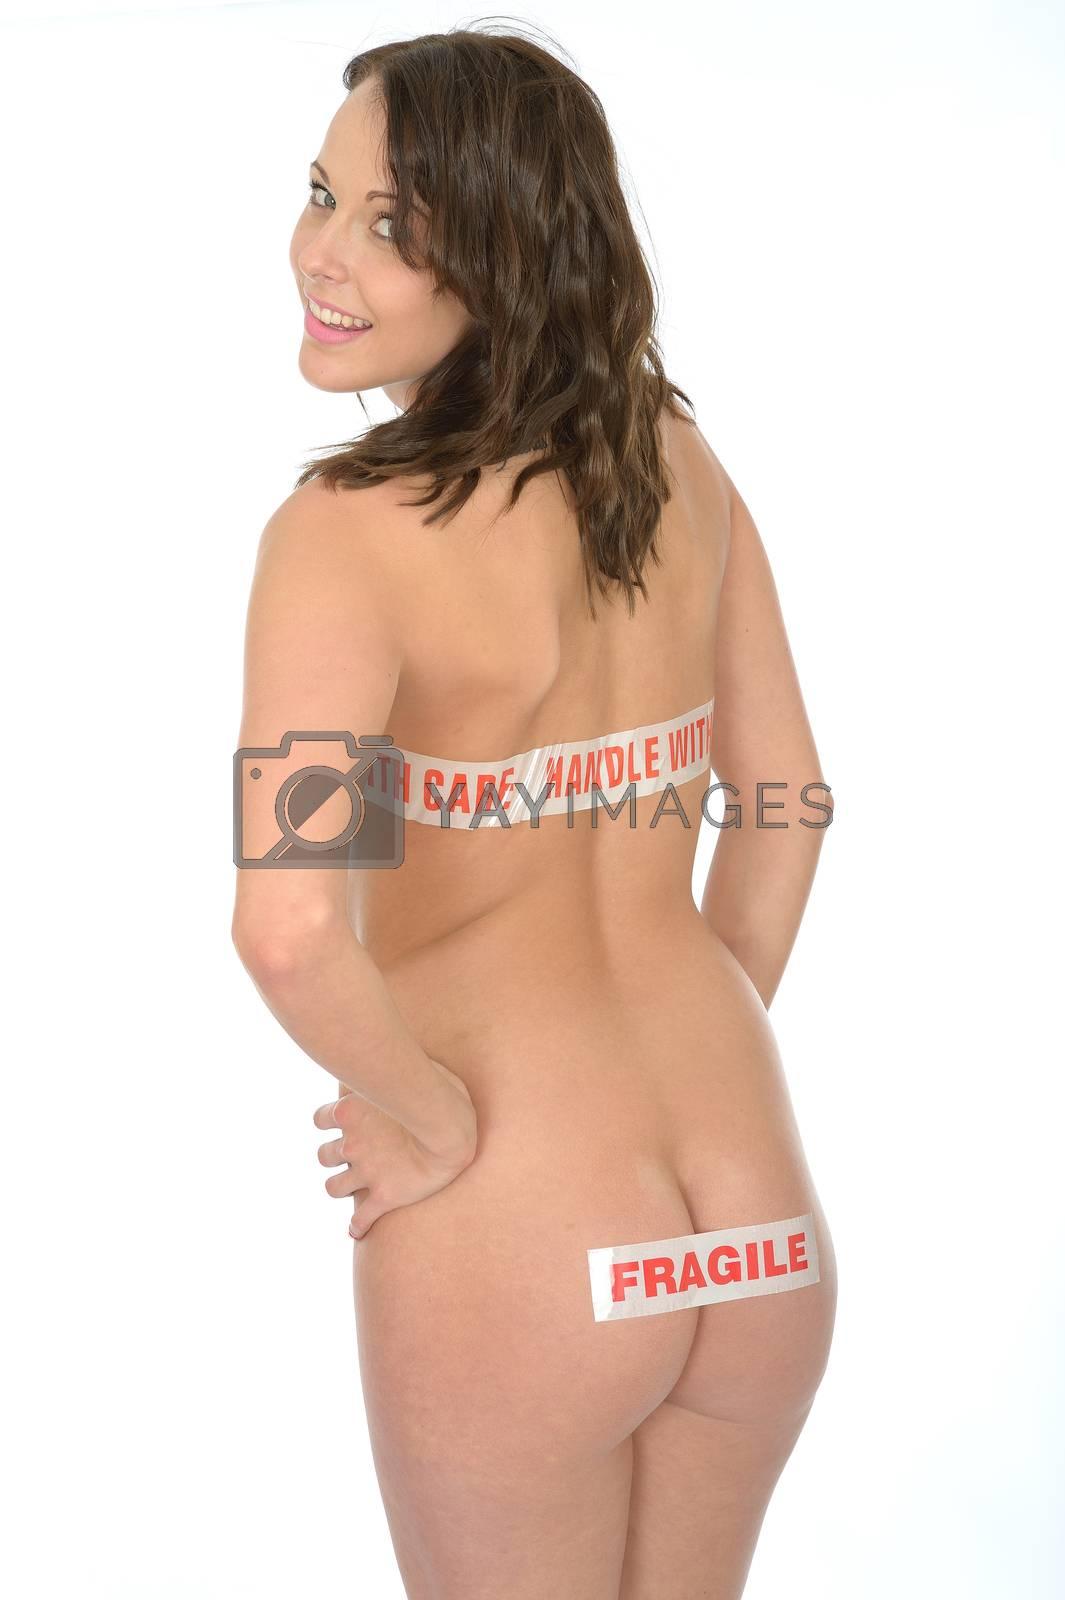 Sexy Sensual Naked Young Pin Up Woman Wearing Descrete Warning Packaging Tape